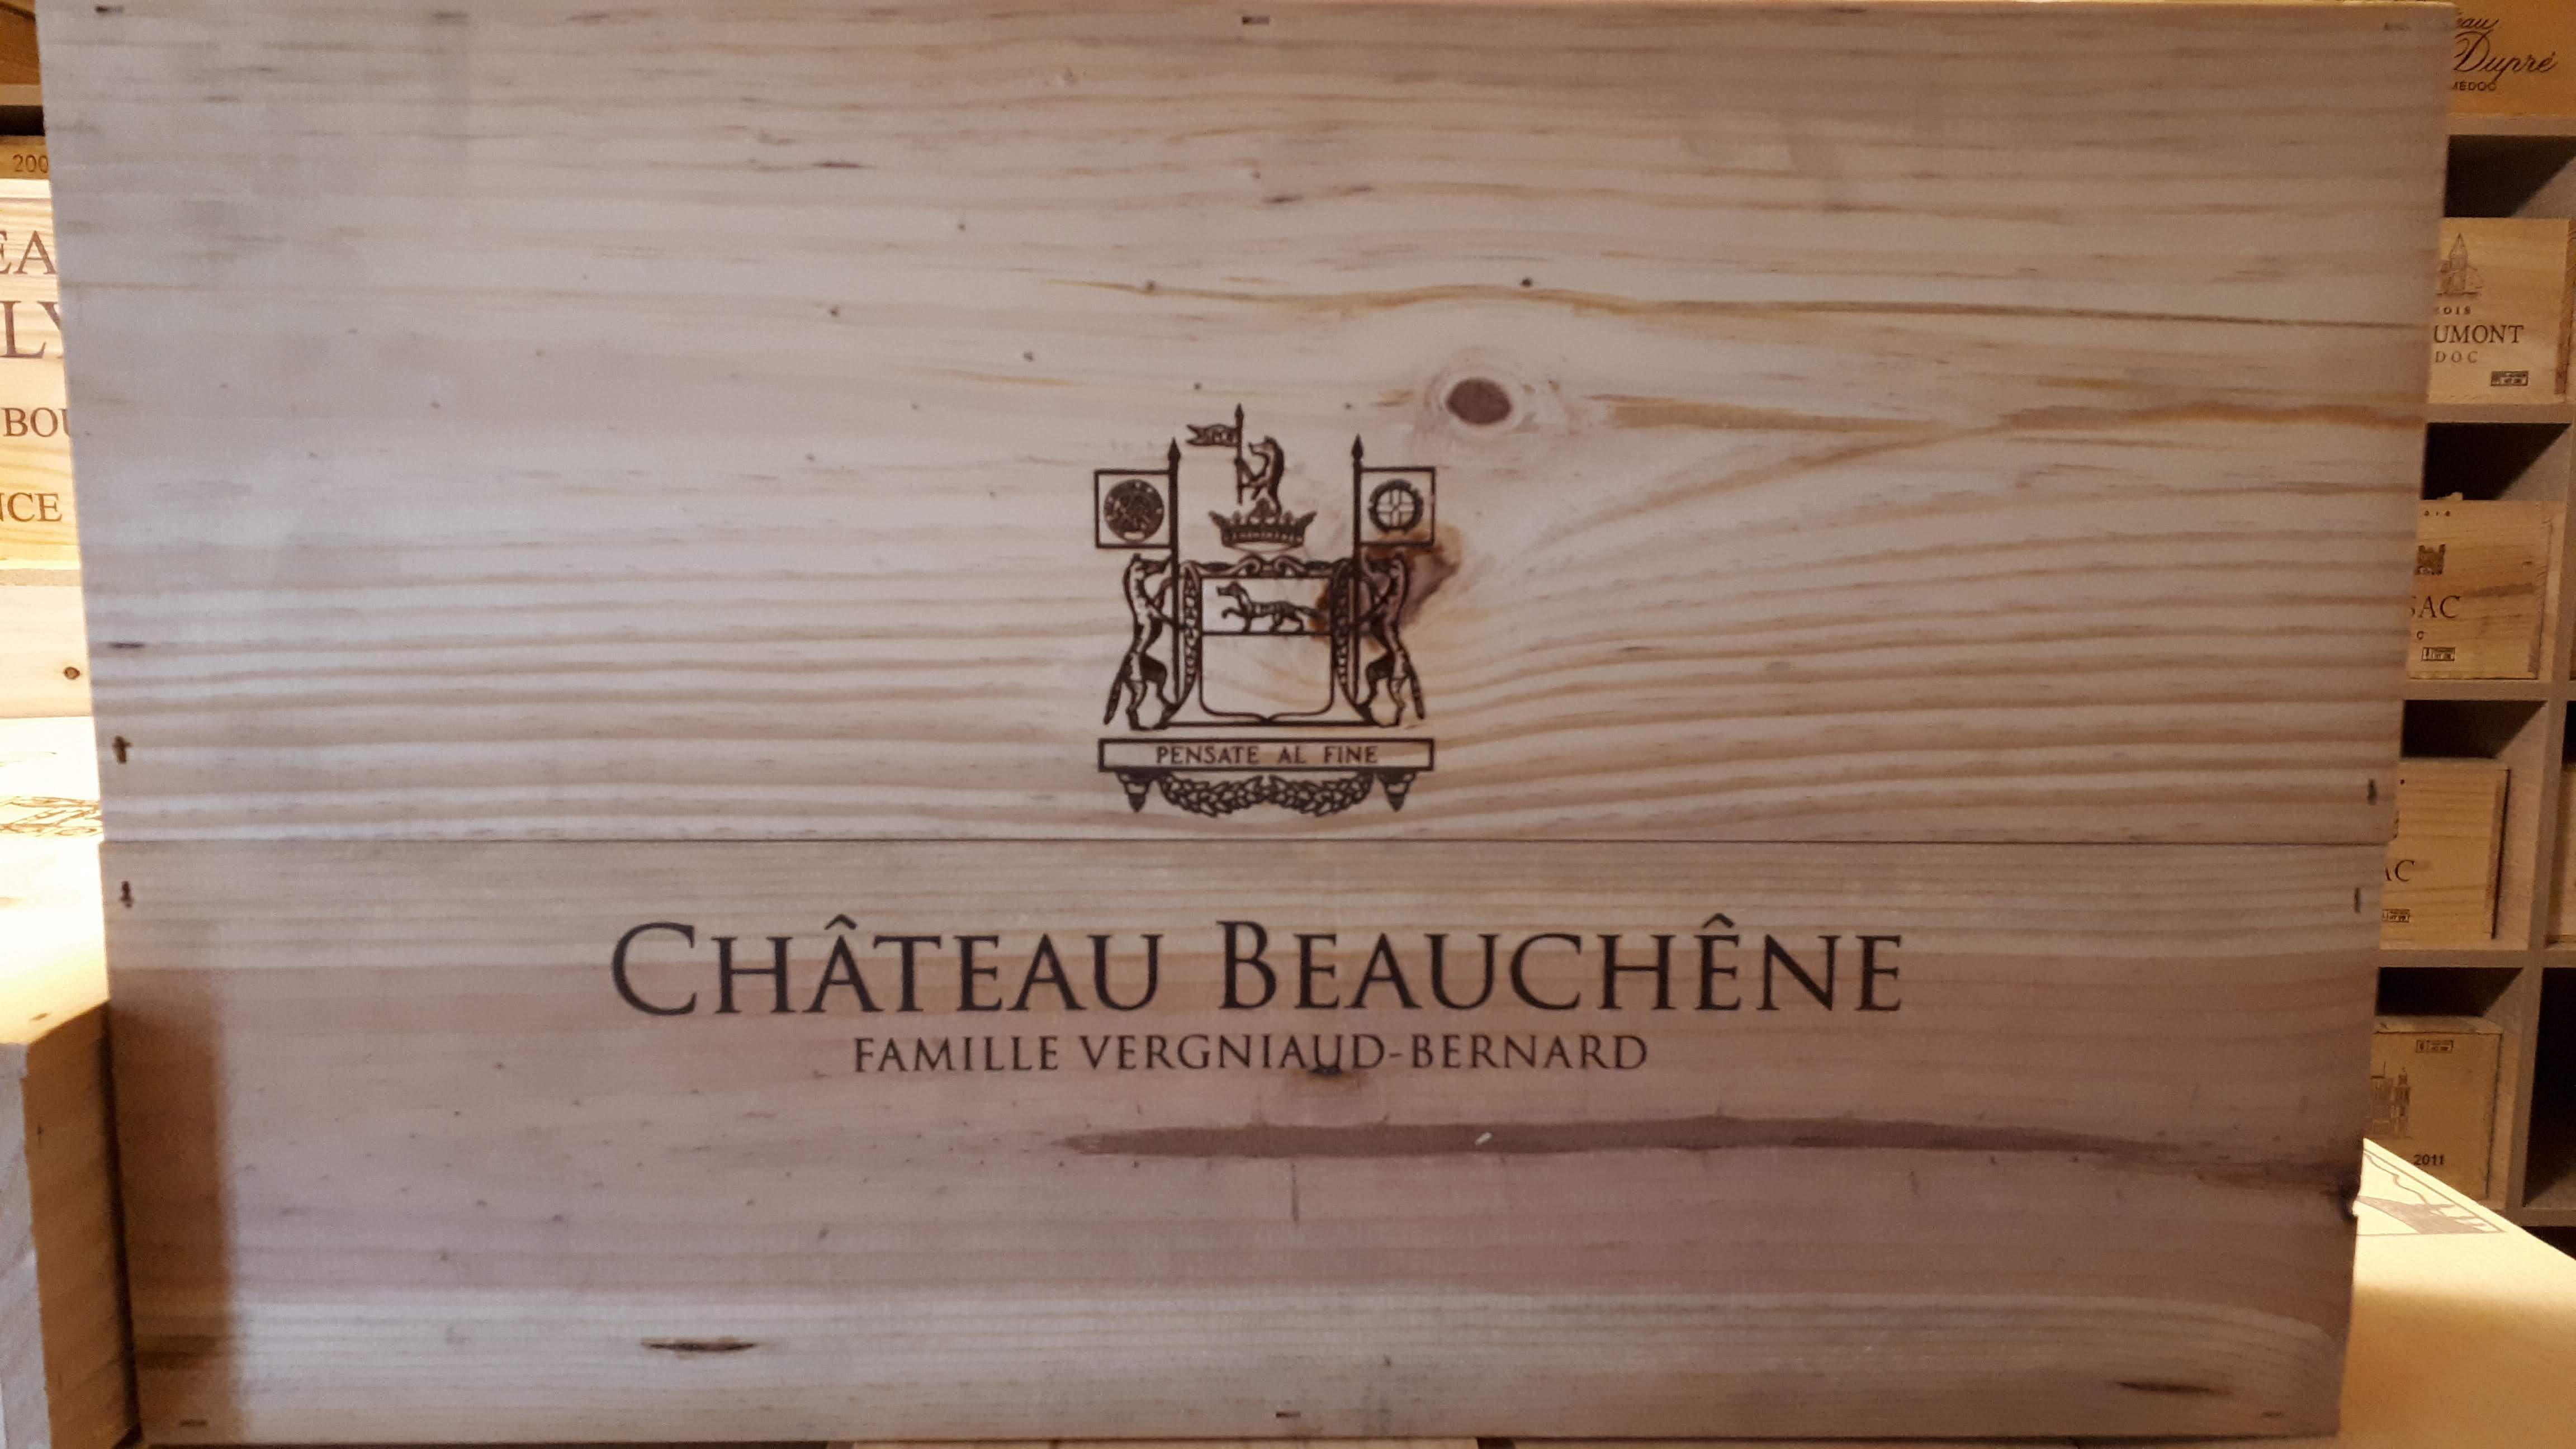 Chateauneuf-du-Pape Grande Reserve Chateau Beauchene